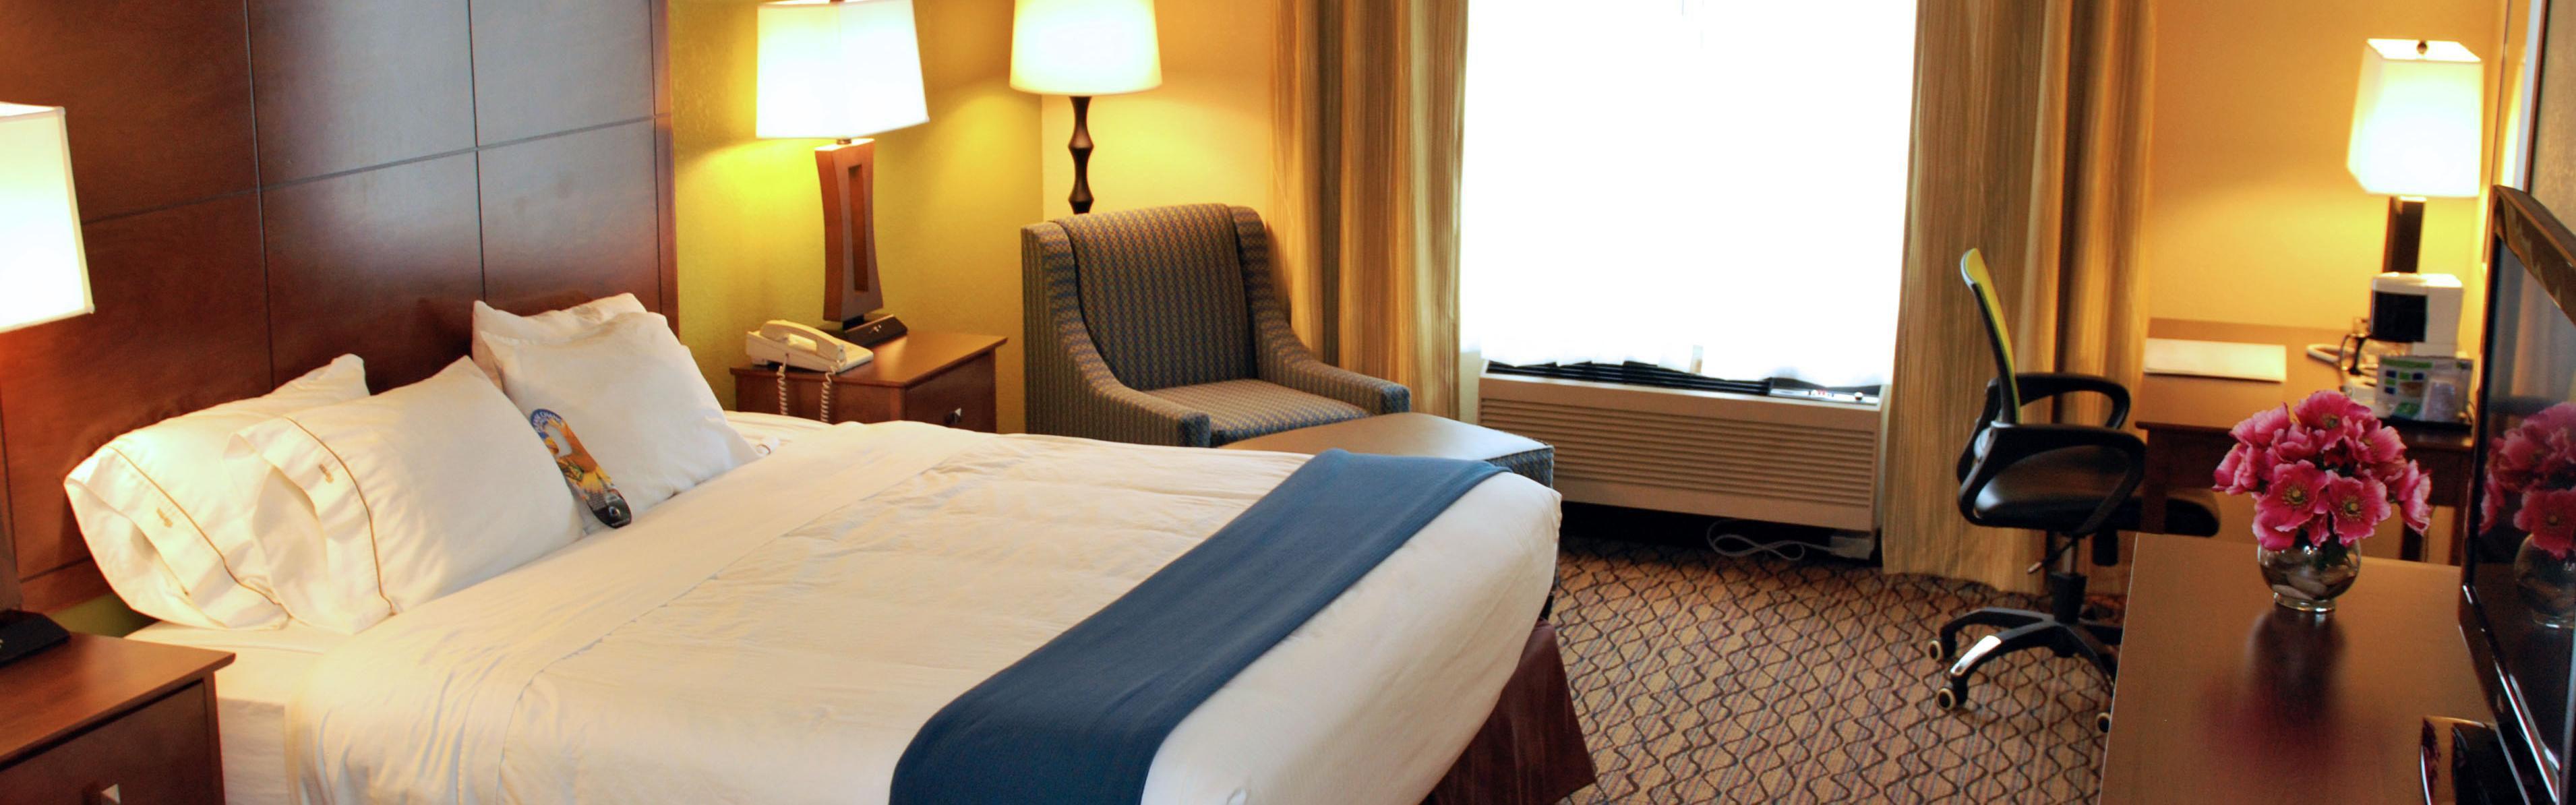 Holiday Inn Express Lapeer image 1